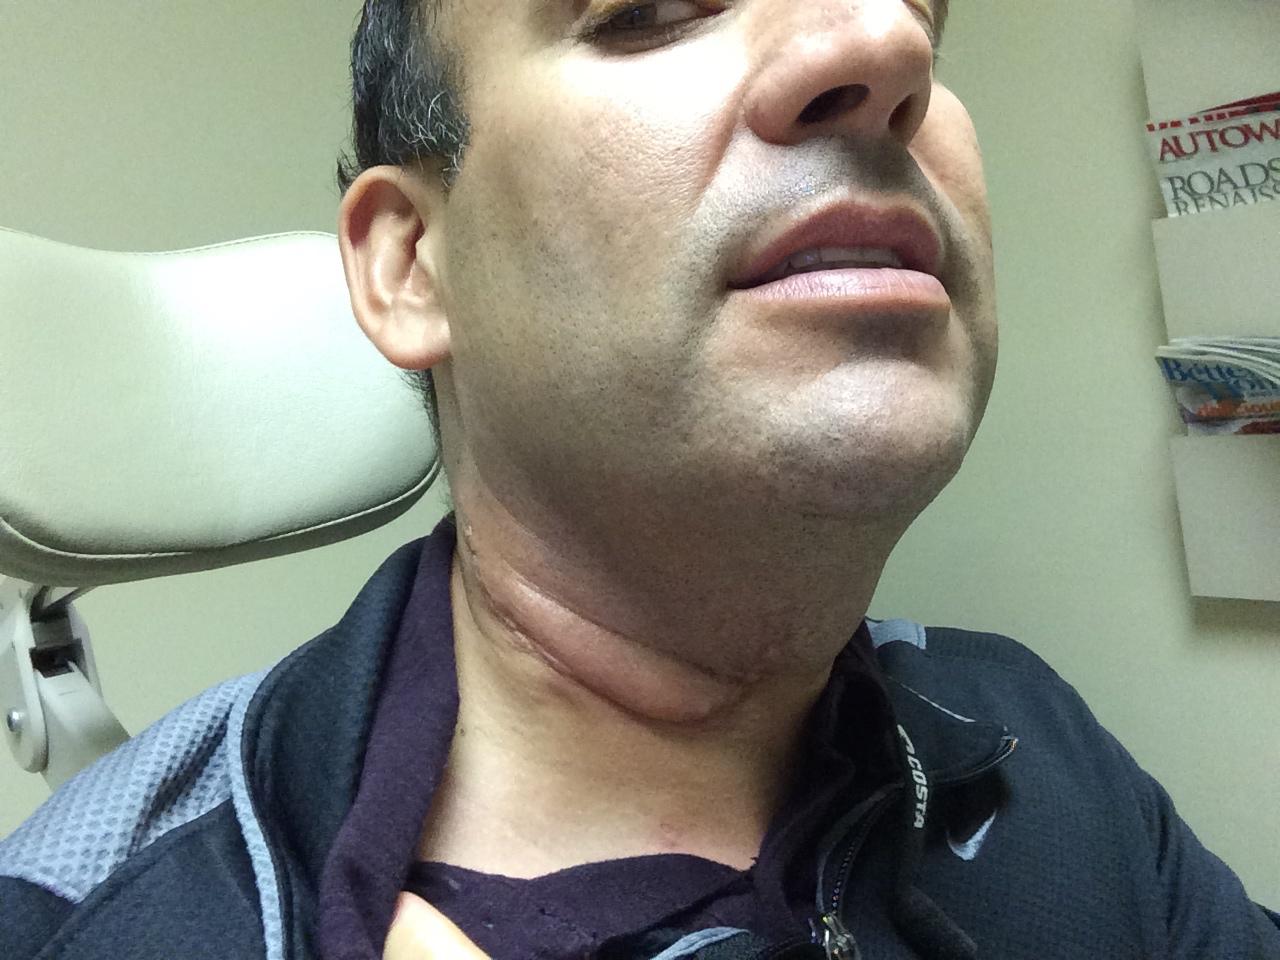 hpv neck lymph nodes)